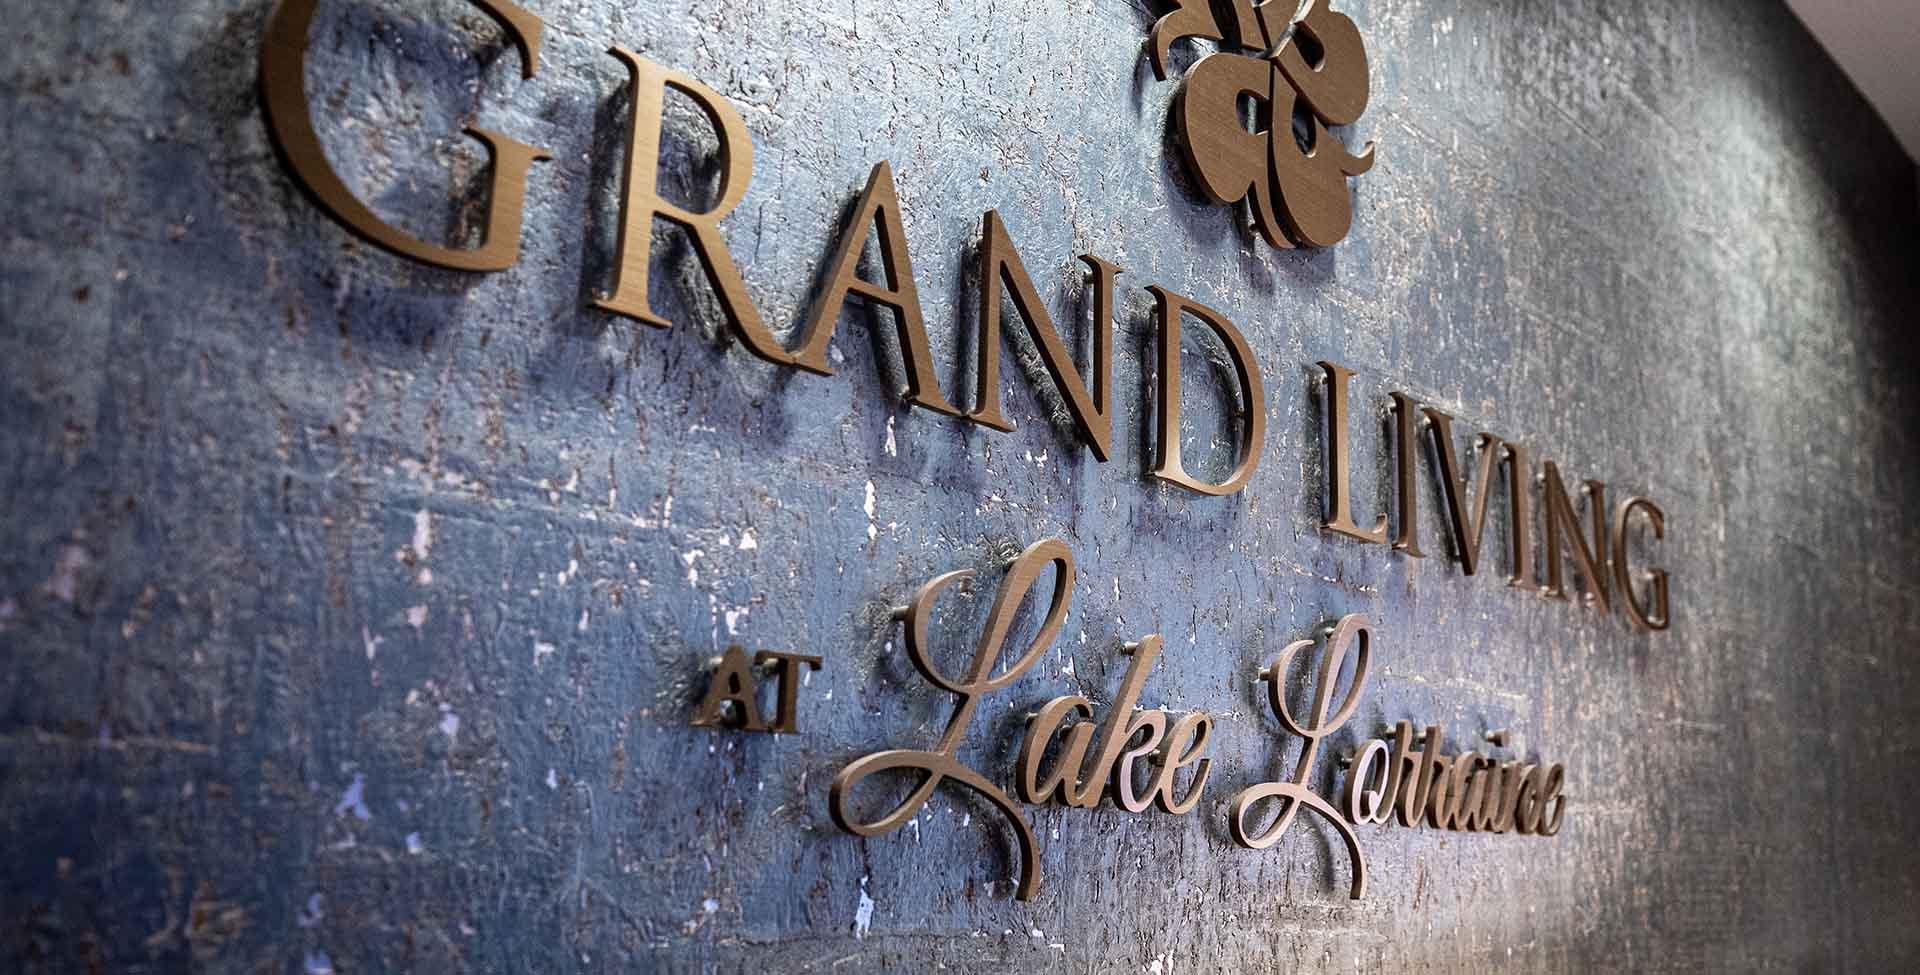 Grand Living at Lake Lorraine signage